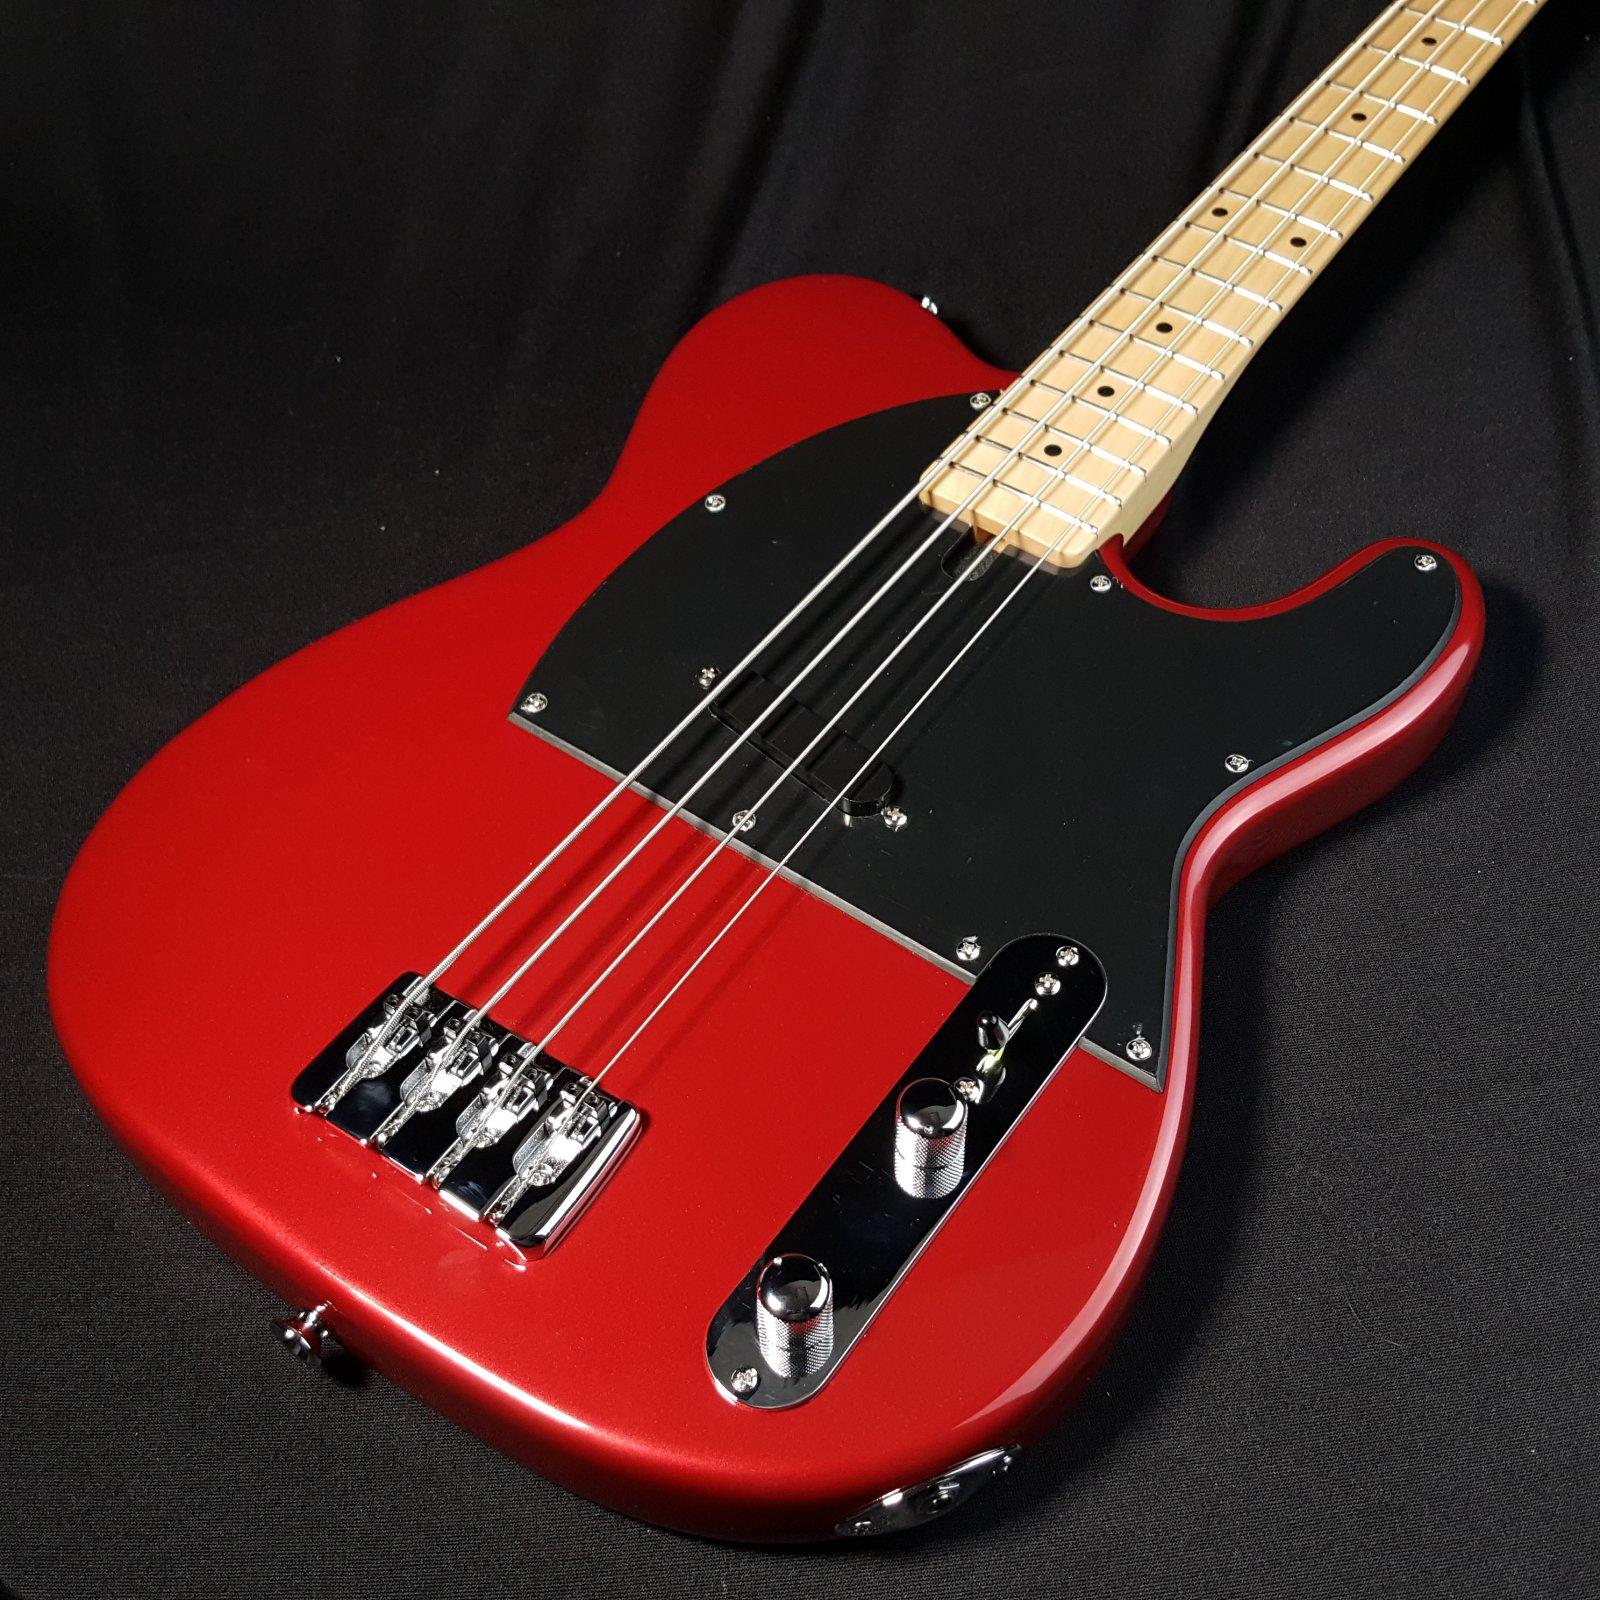 2019 Maruszczyk Mr. Tee Solid Body Electric Bass w/ Maruszczyk Gig Bag 8lb 4oz